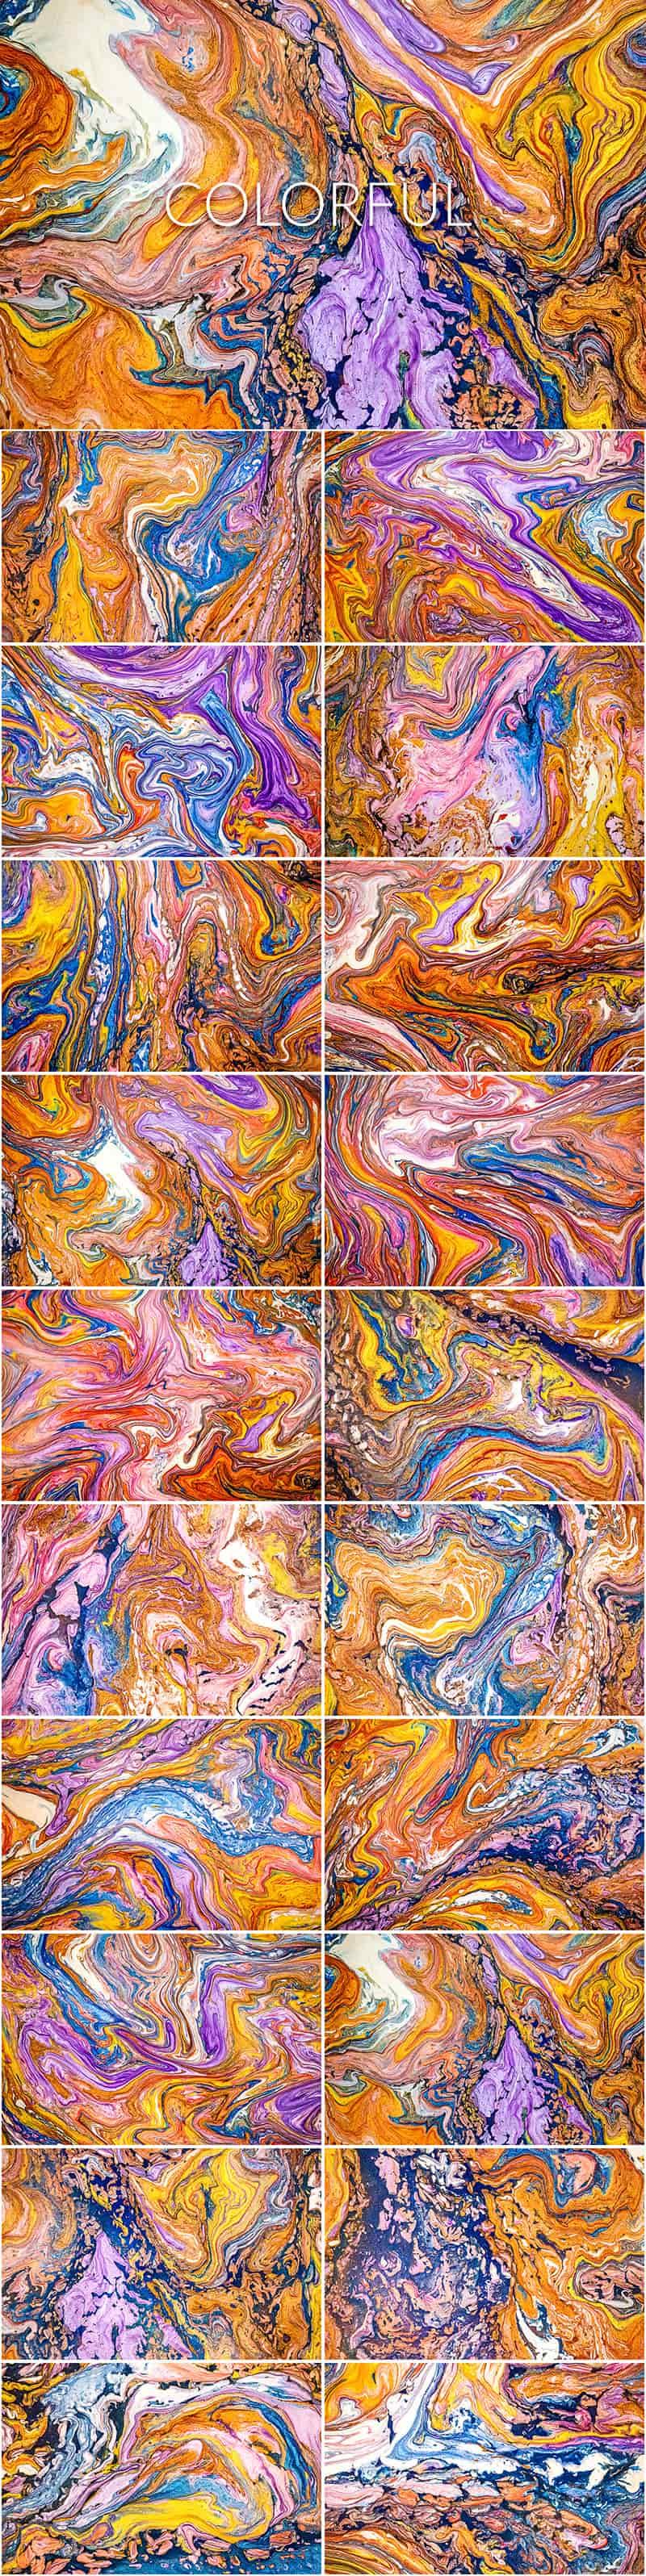 750+ Best Liquid Paint Backgrounds in 2020 - Liquid Paint Colorful PREVIEW min